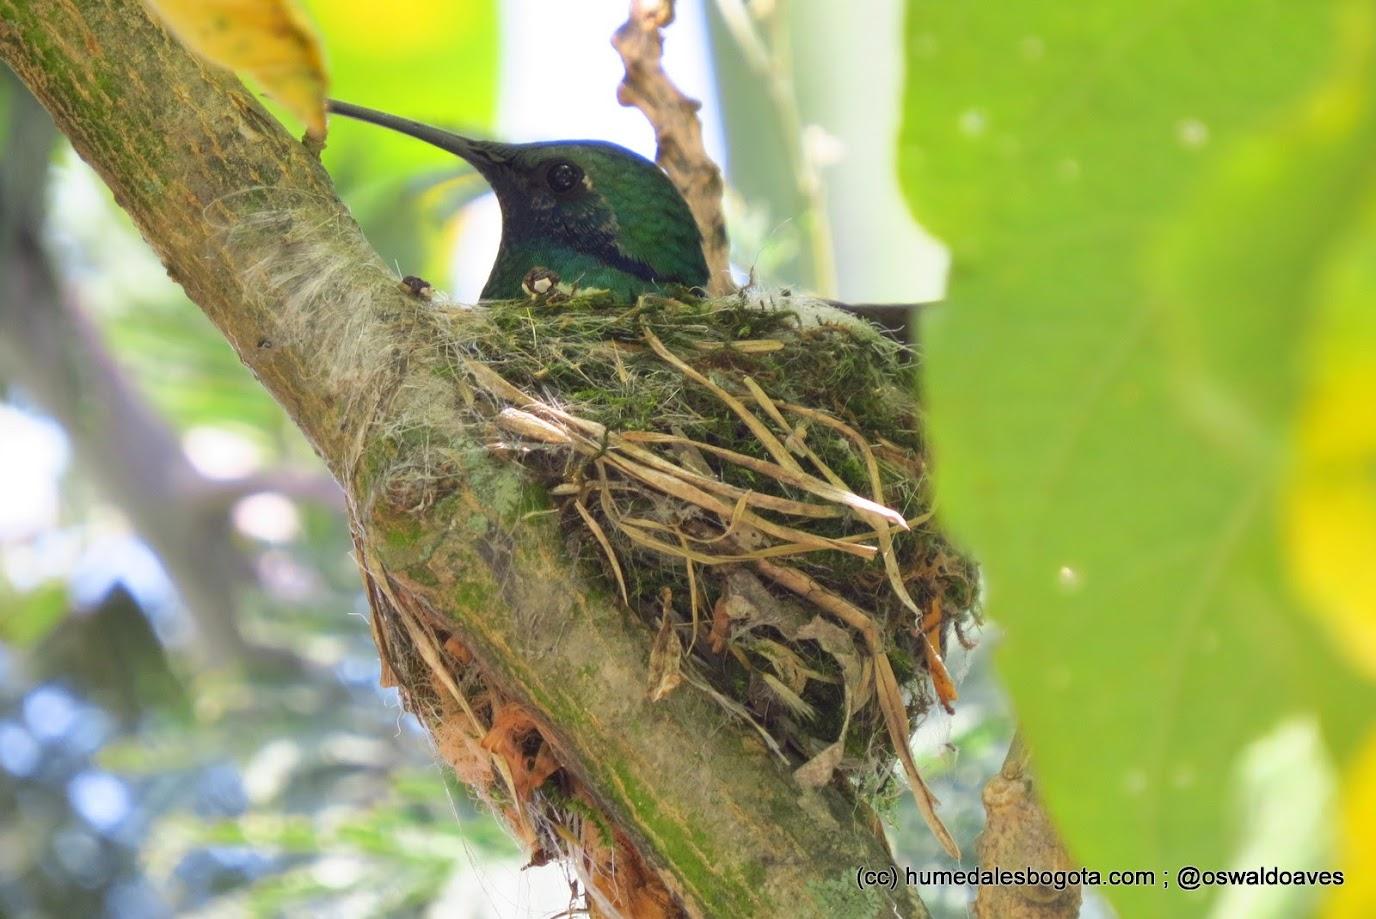 Colibrí en nido